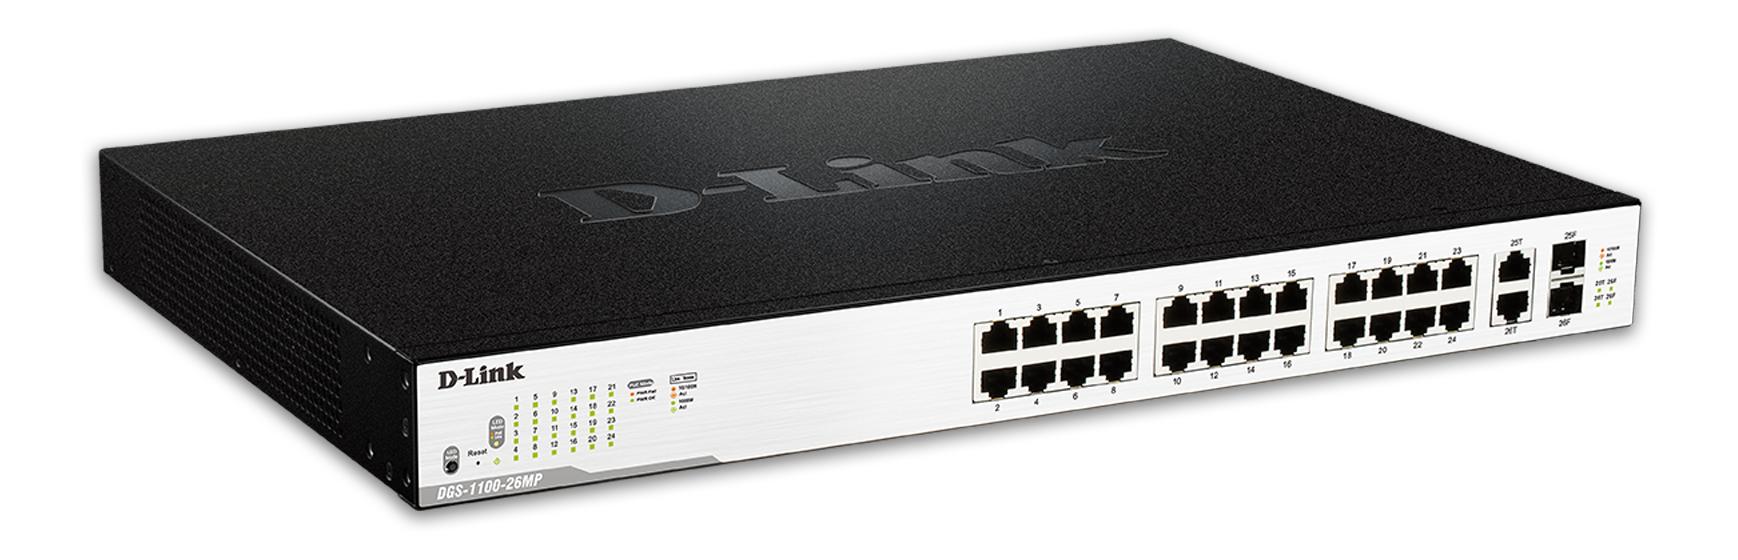 D-Link nätverksswitch, 24xRJ45, 2xSFP, PoE plus, Gigabit, svart/silver